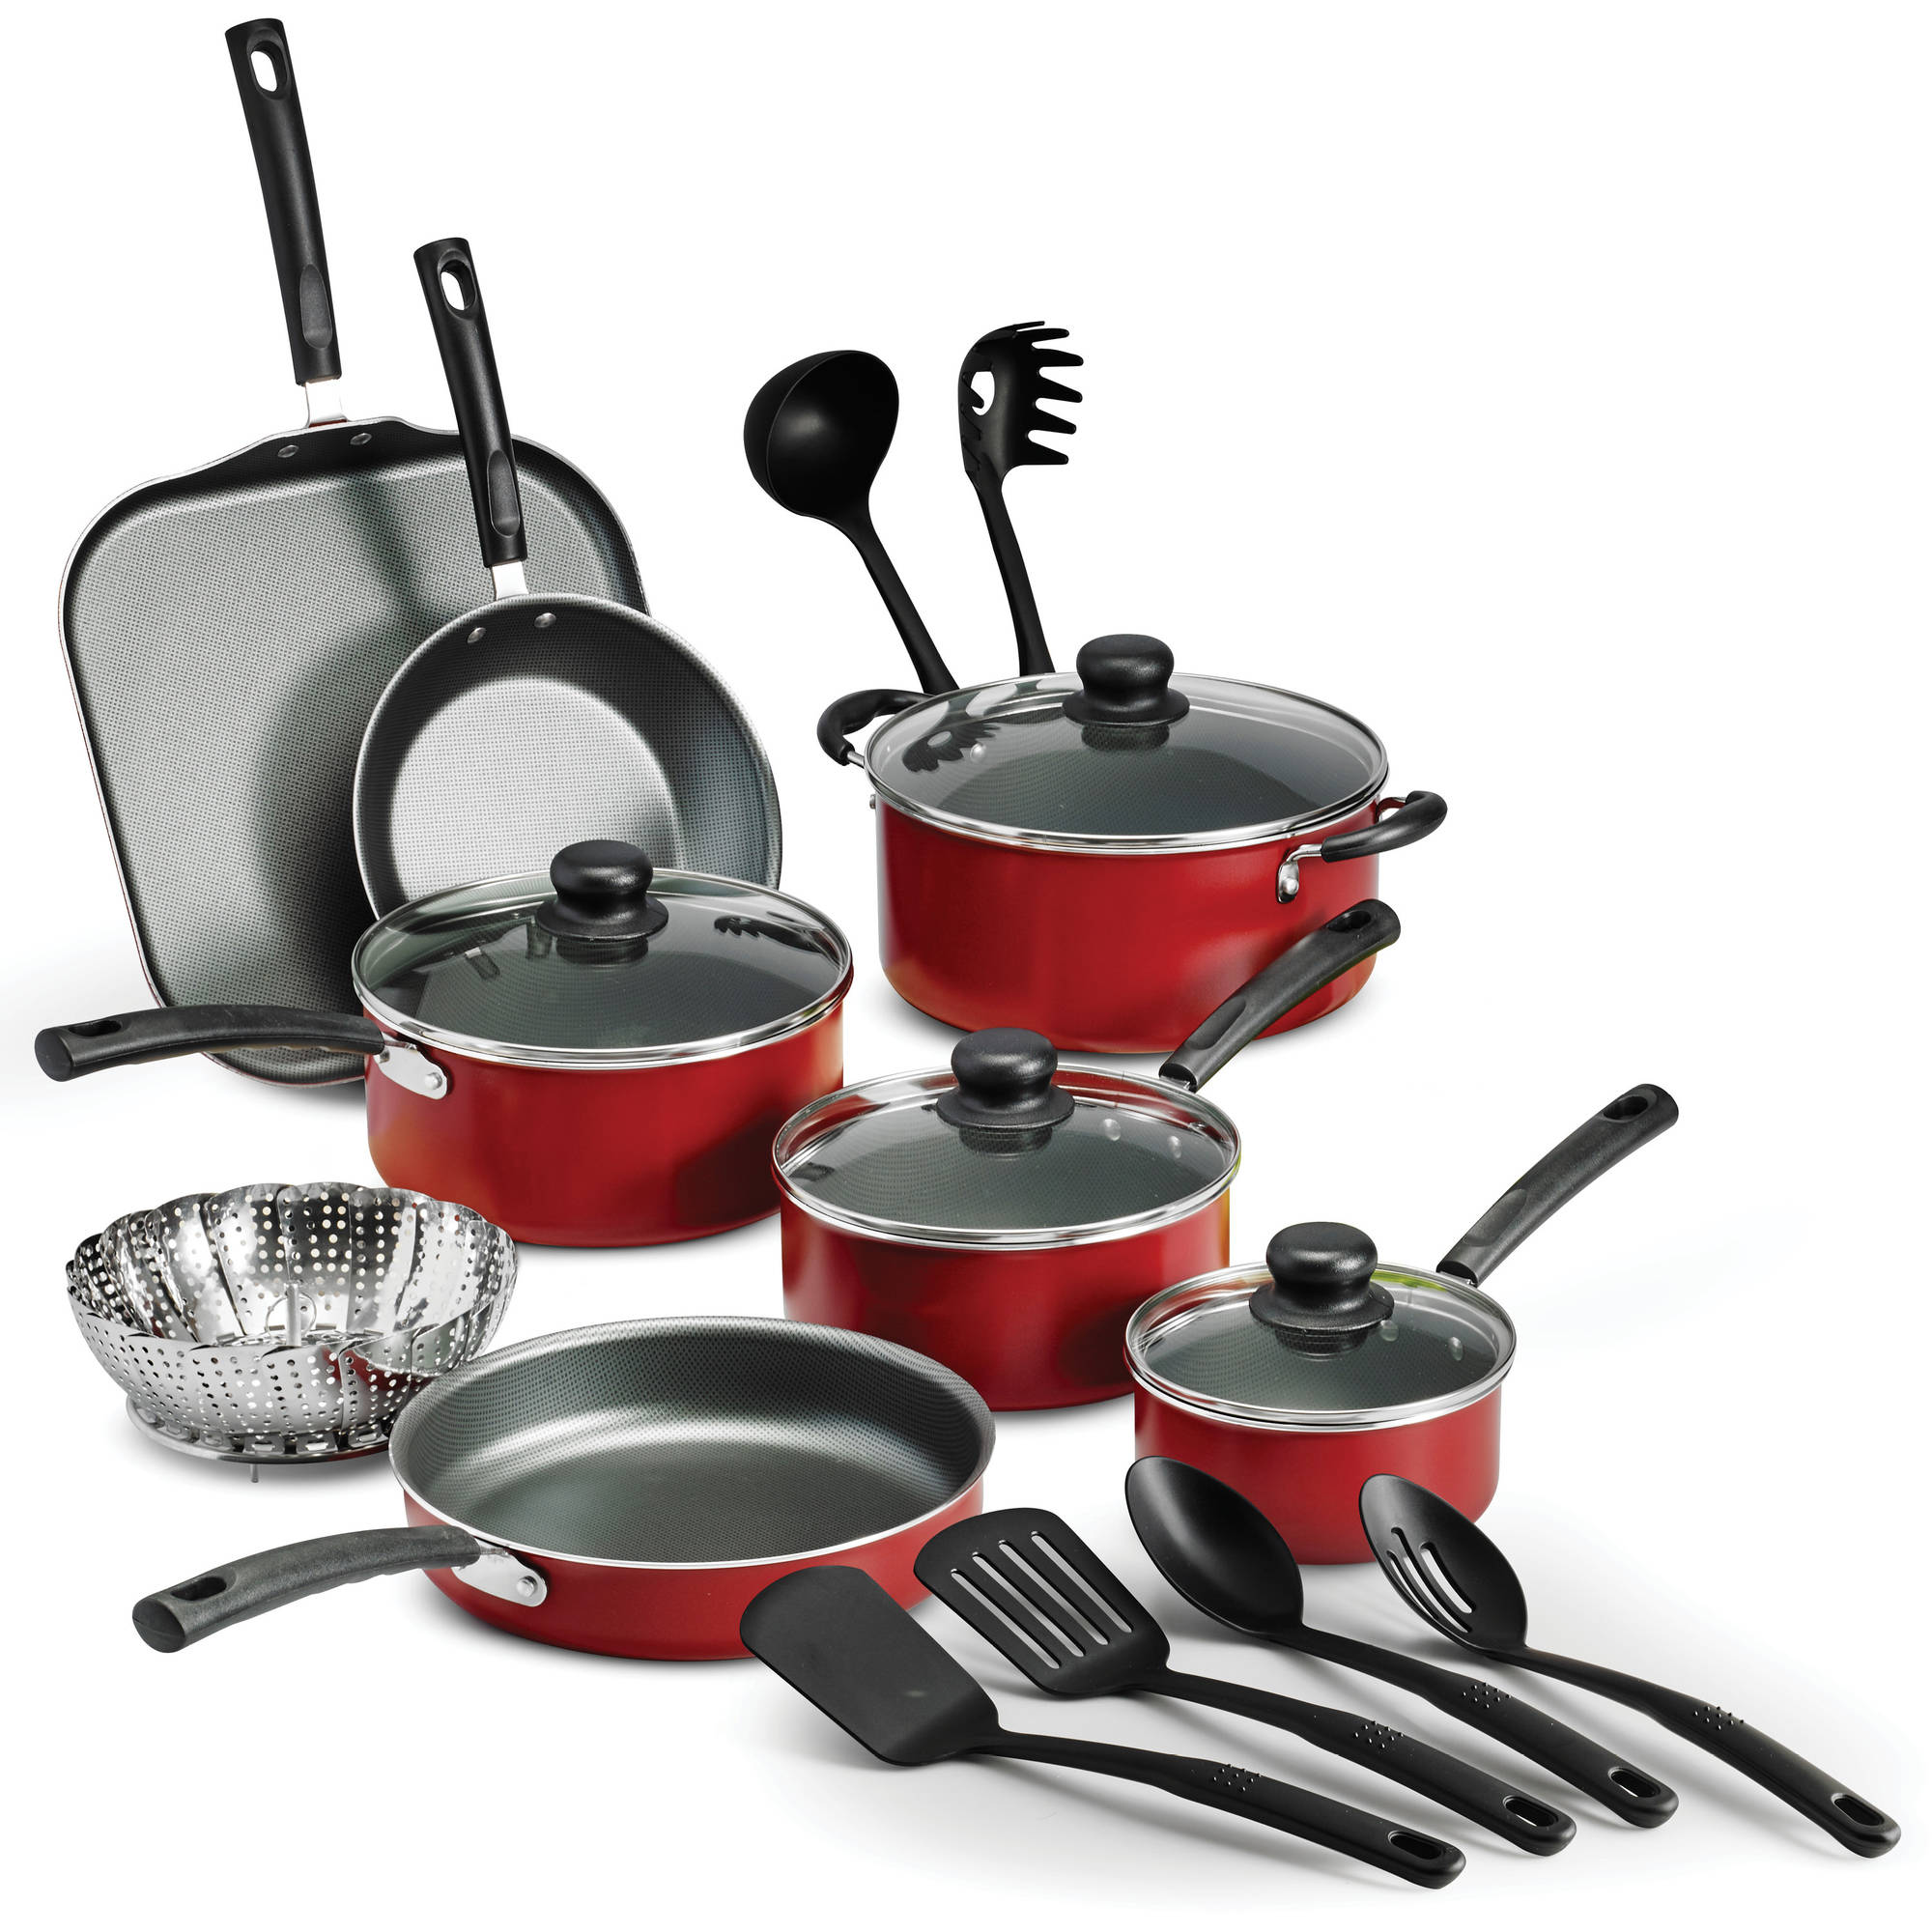 Tramontina PrimaWare 18-Piece Nonstick Cookware Set